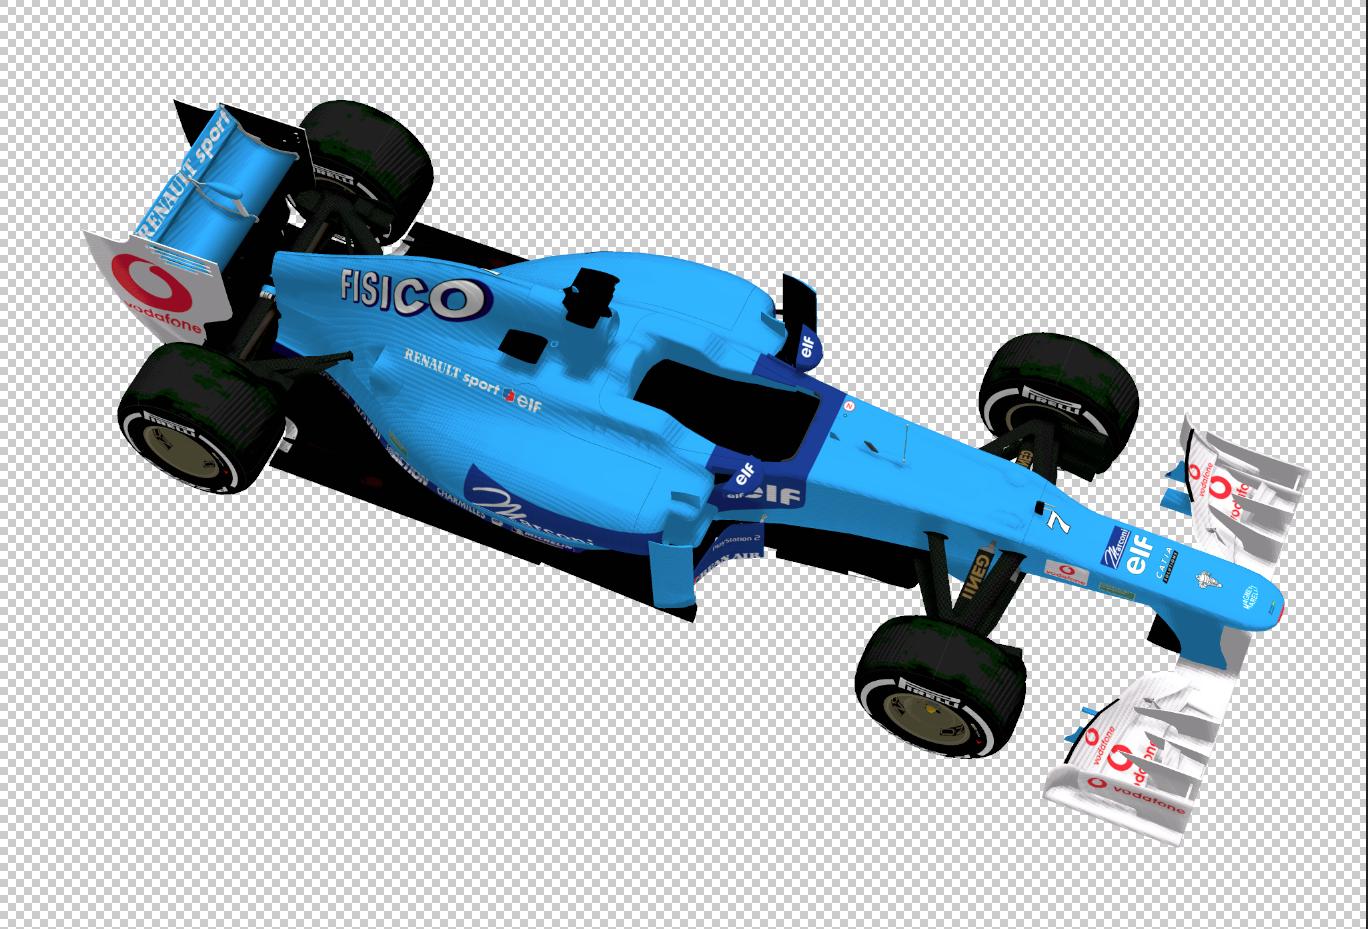 2001 Benetton Non-Tobacco (#7 FISICO).PNG